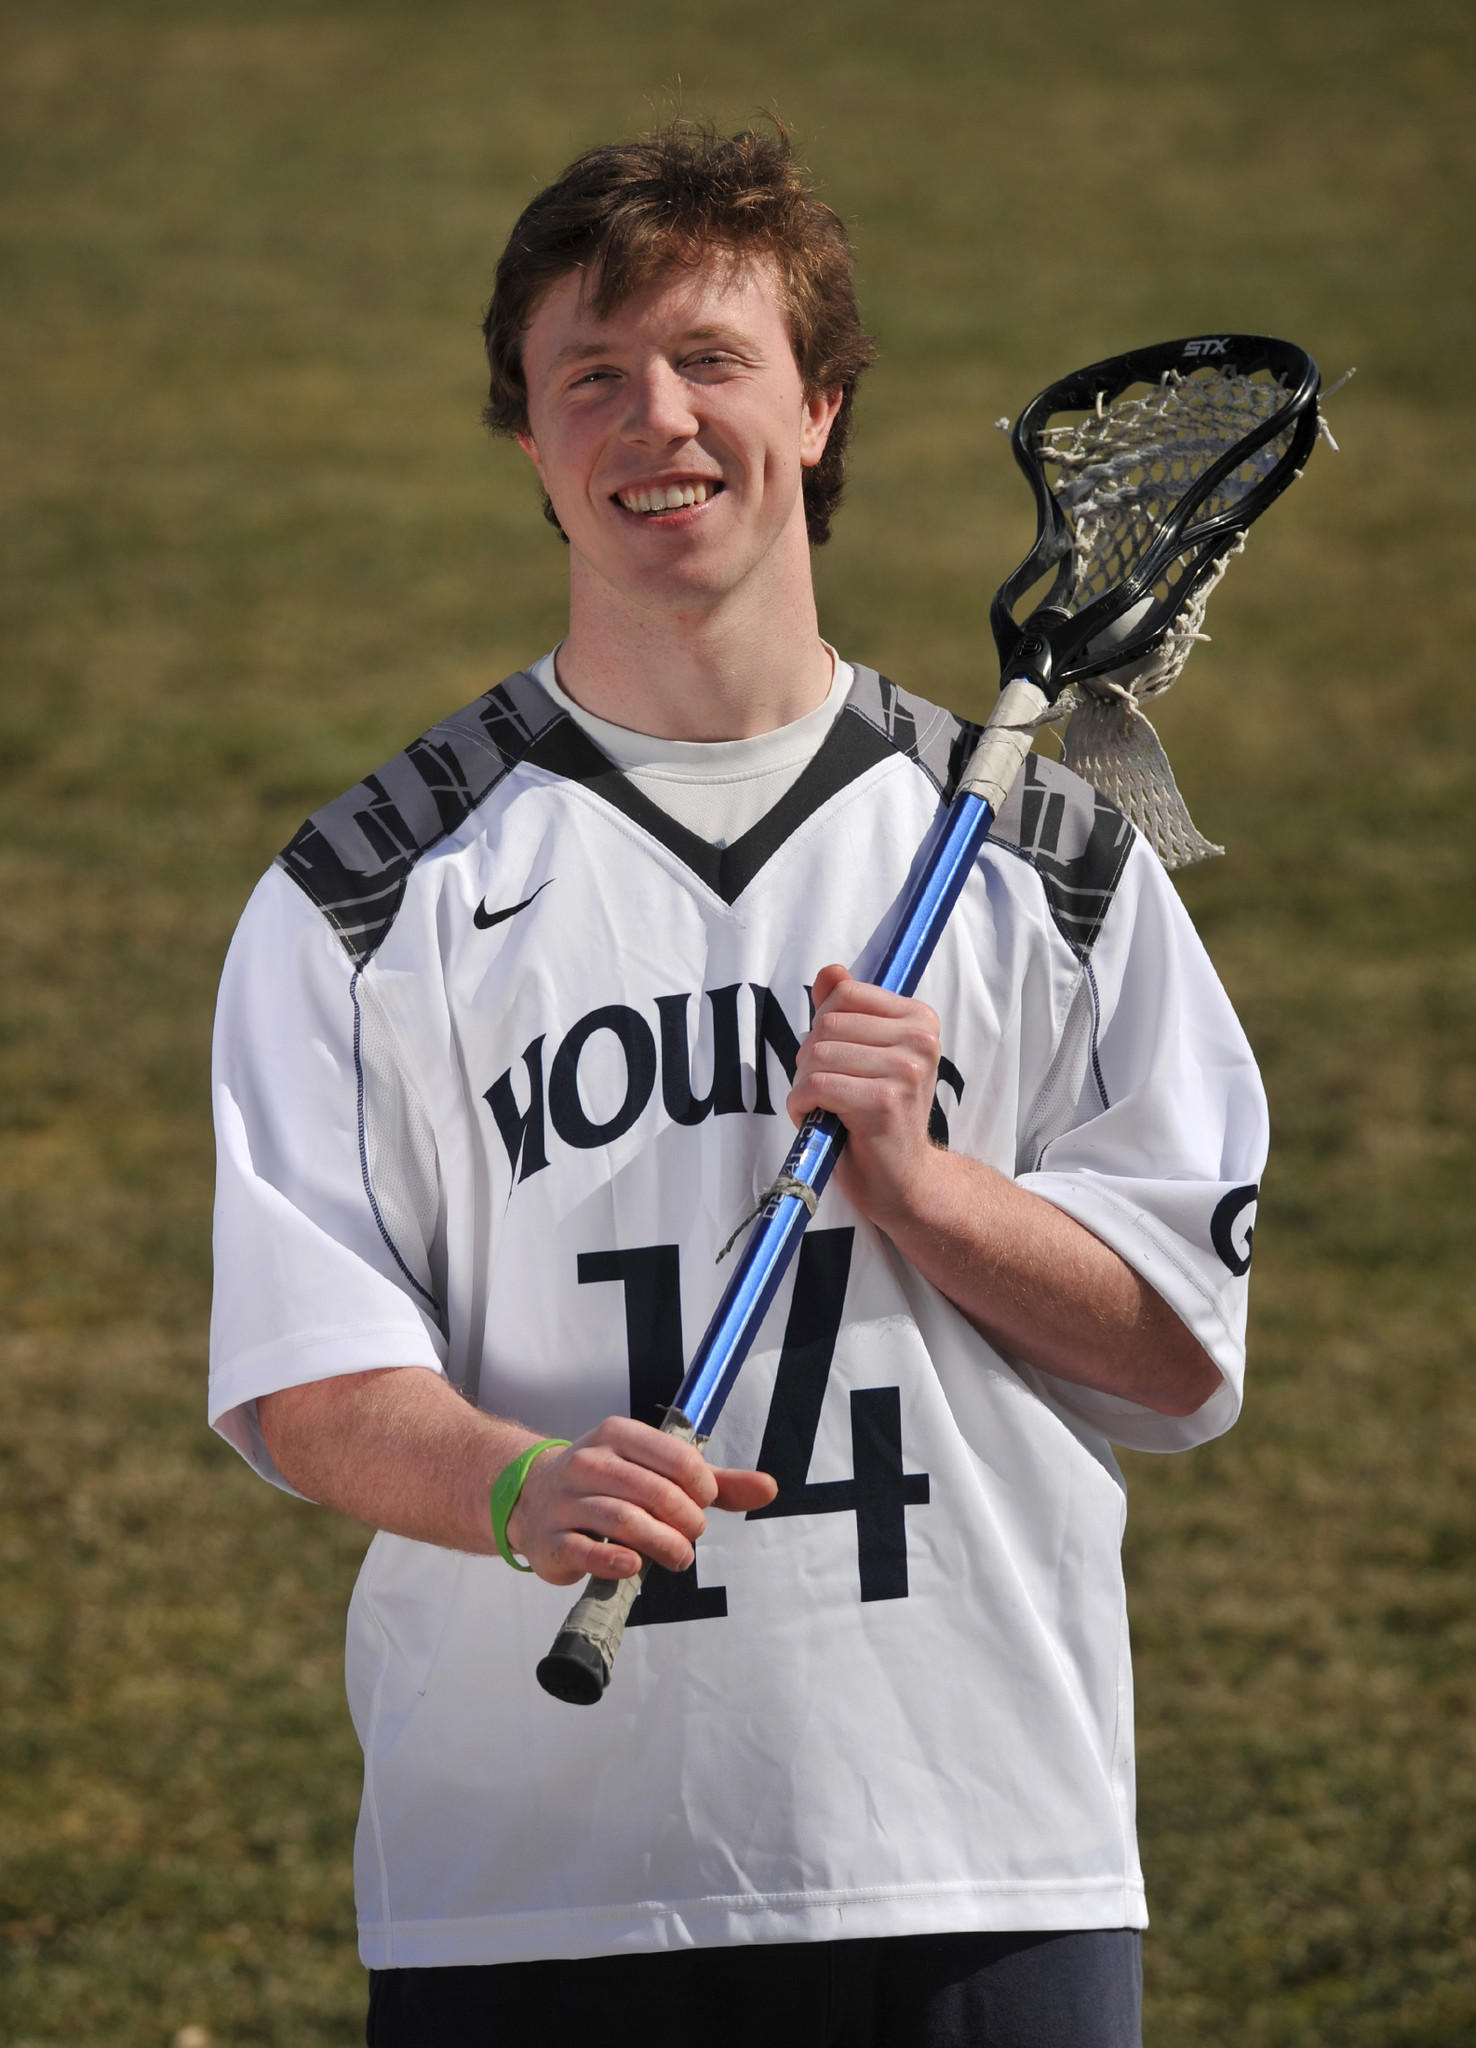 William McBride, 18, a senior lacrosse player at Gilman.